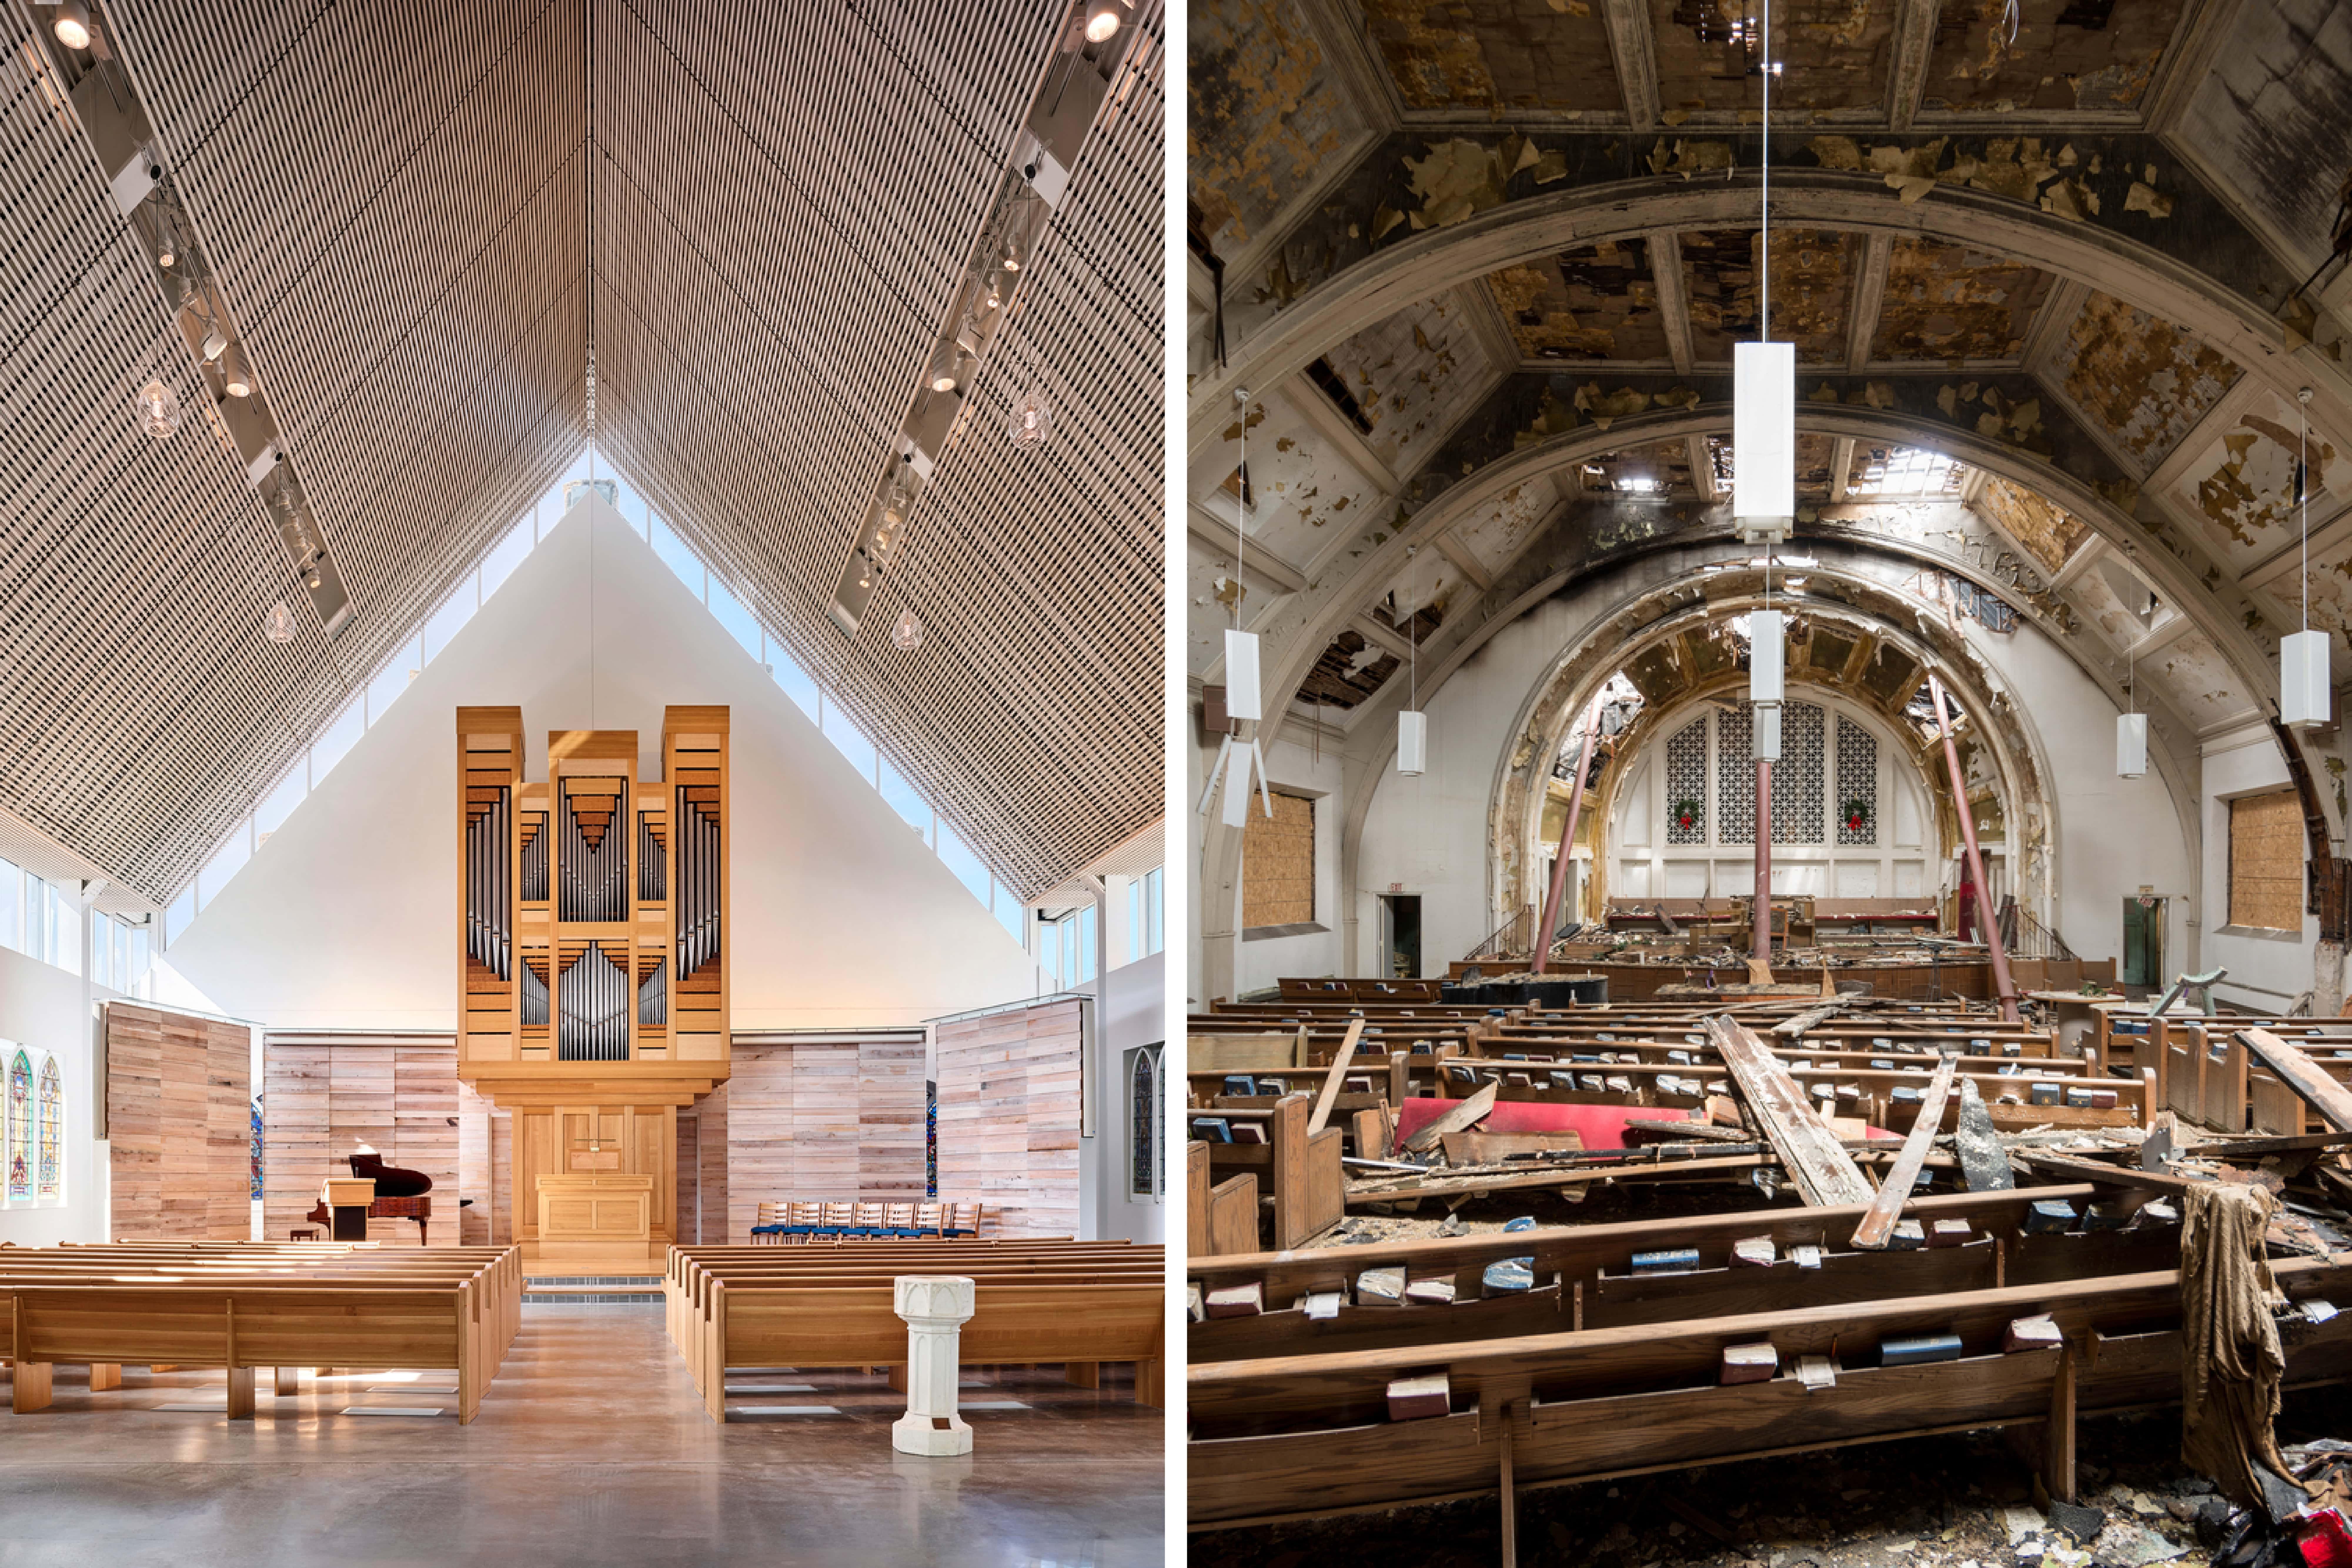 Westport Presbyterian Church Aia Kansas City 2016 Design